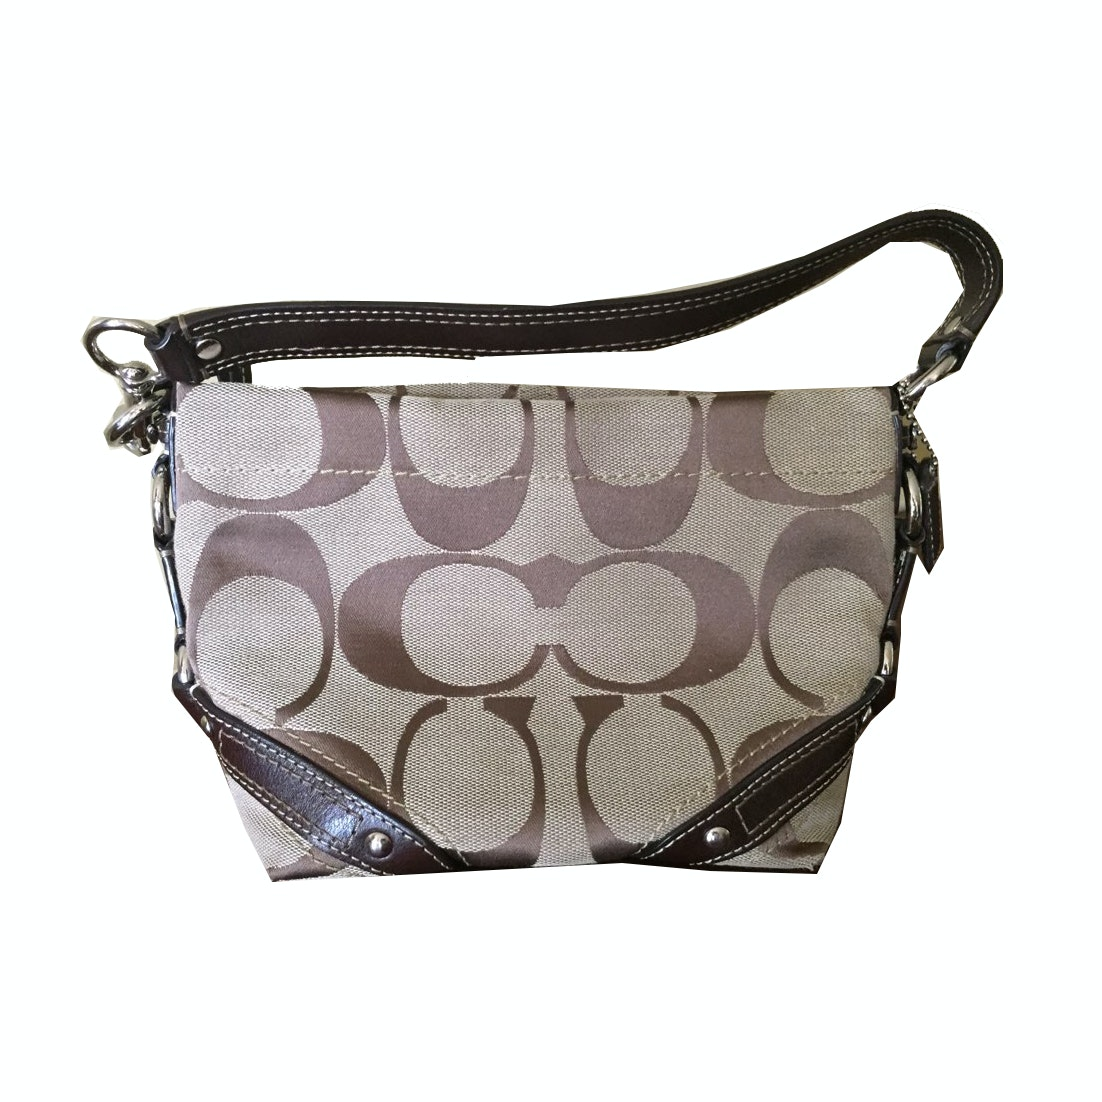 Coach Carly Signature Jacquard and Leather Handbag